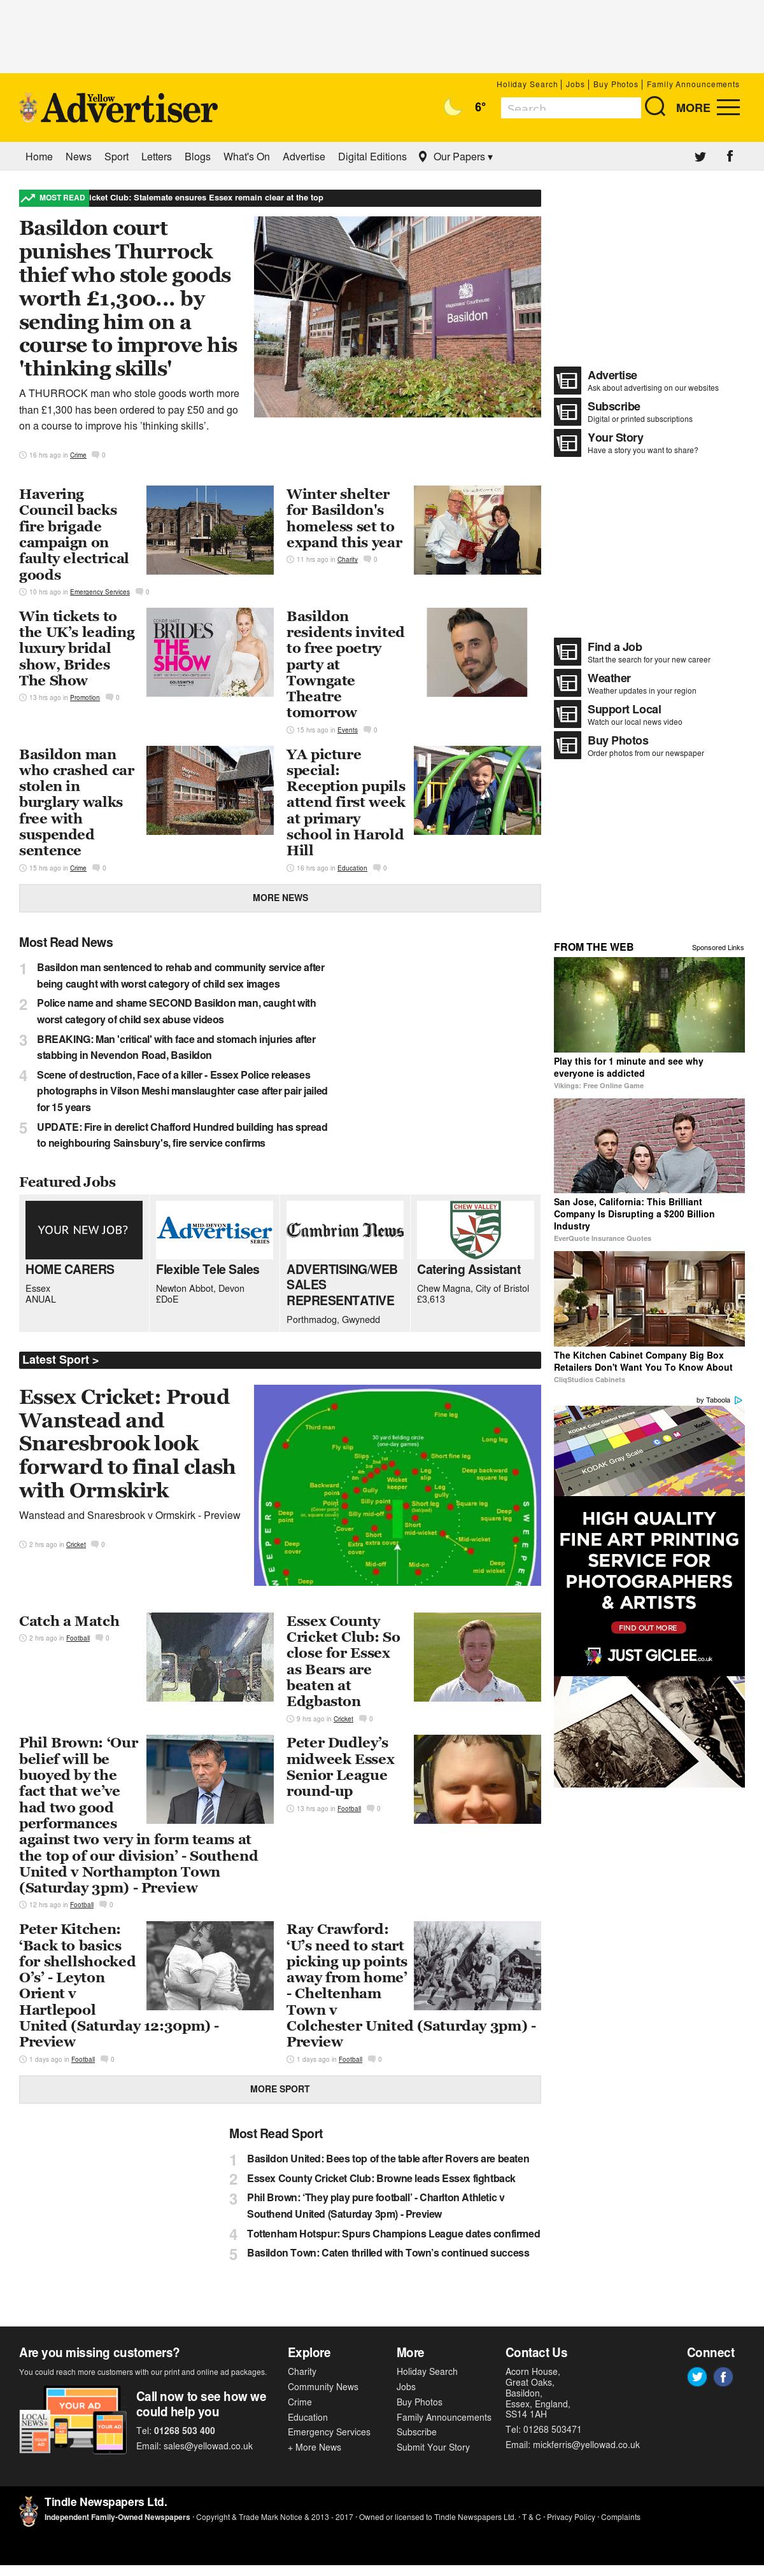 North eastern weekly | digital editions.